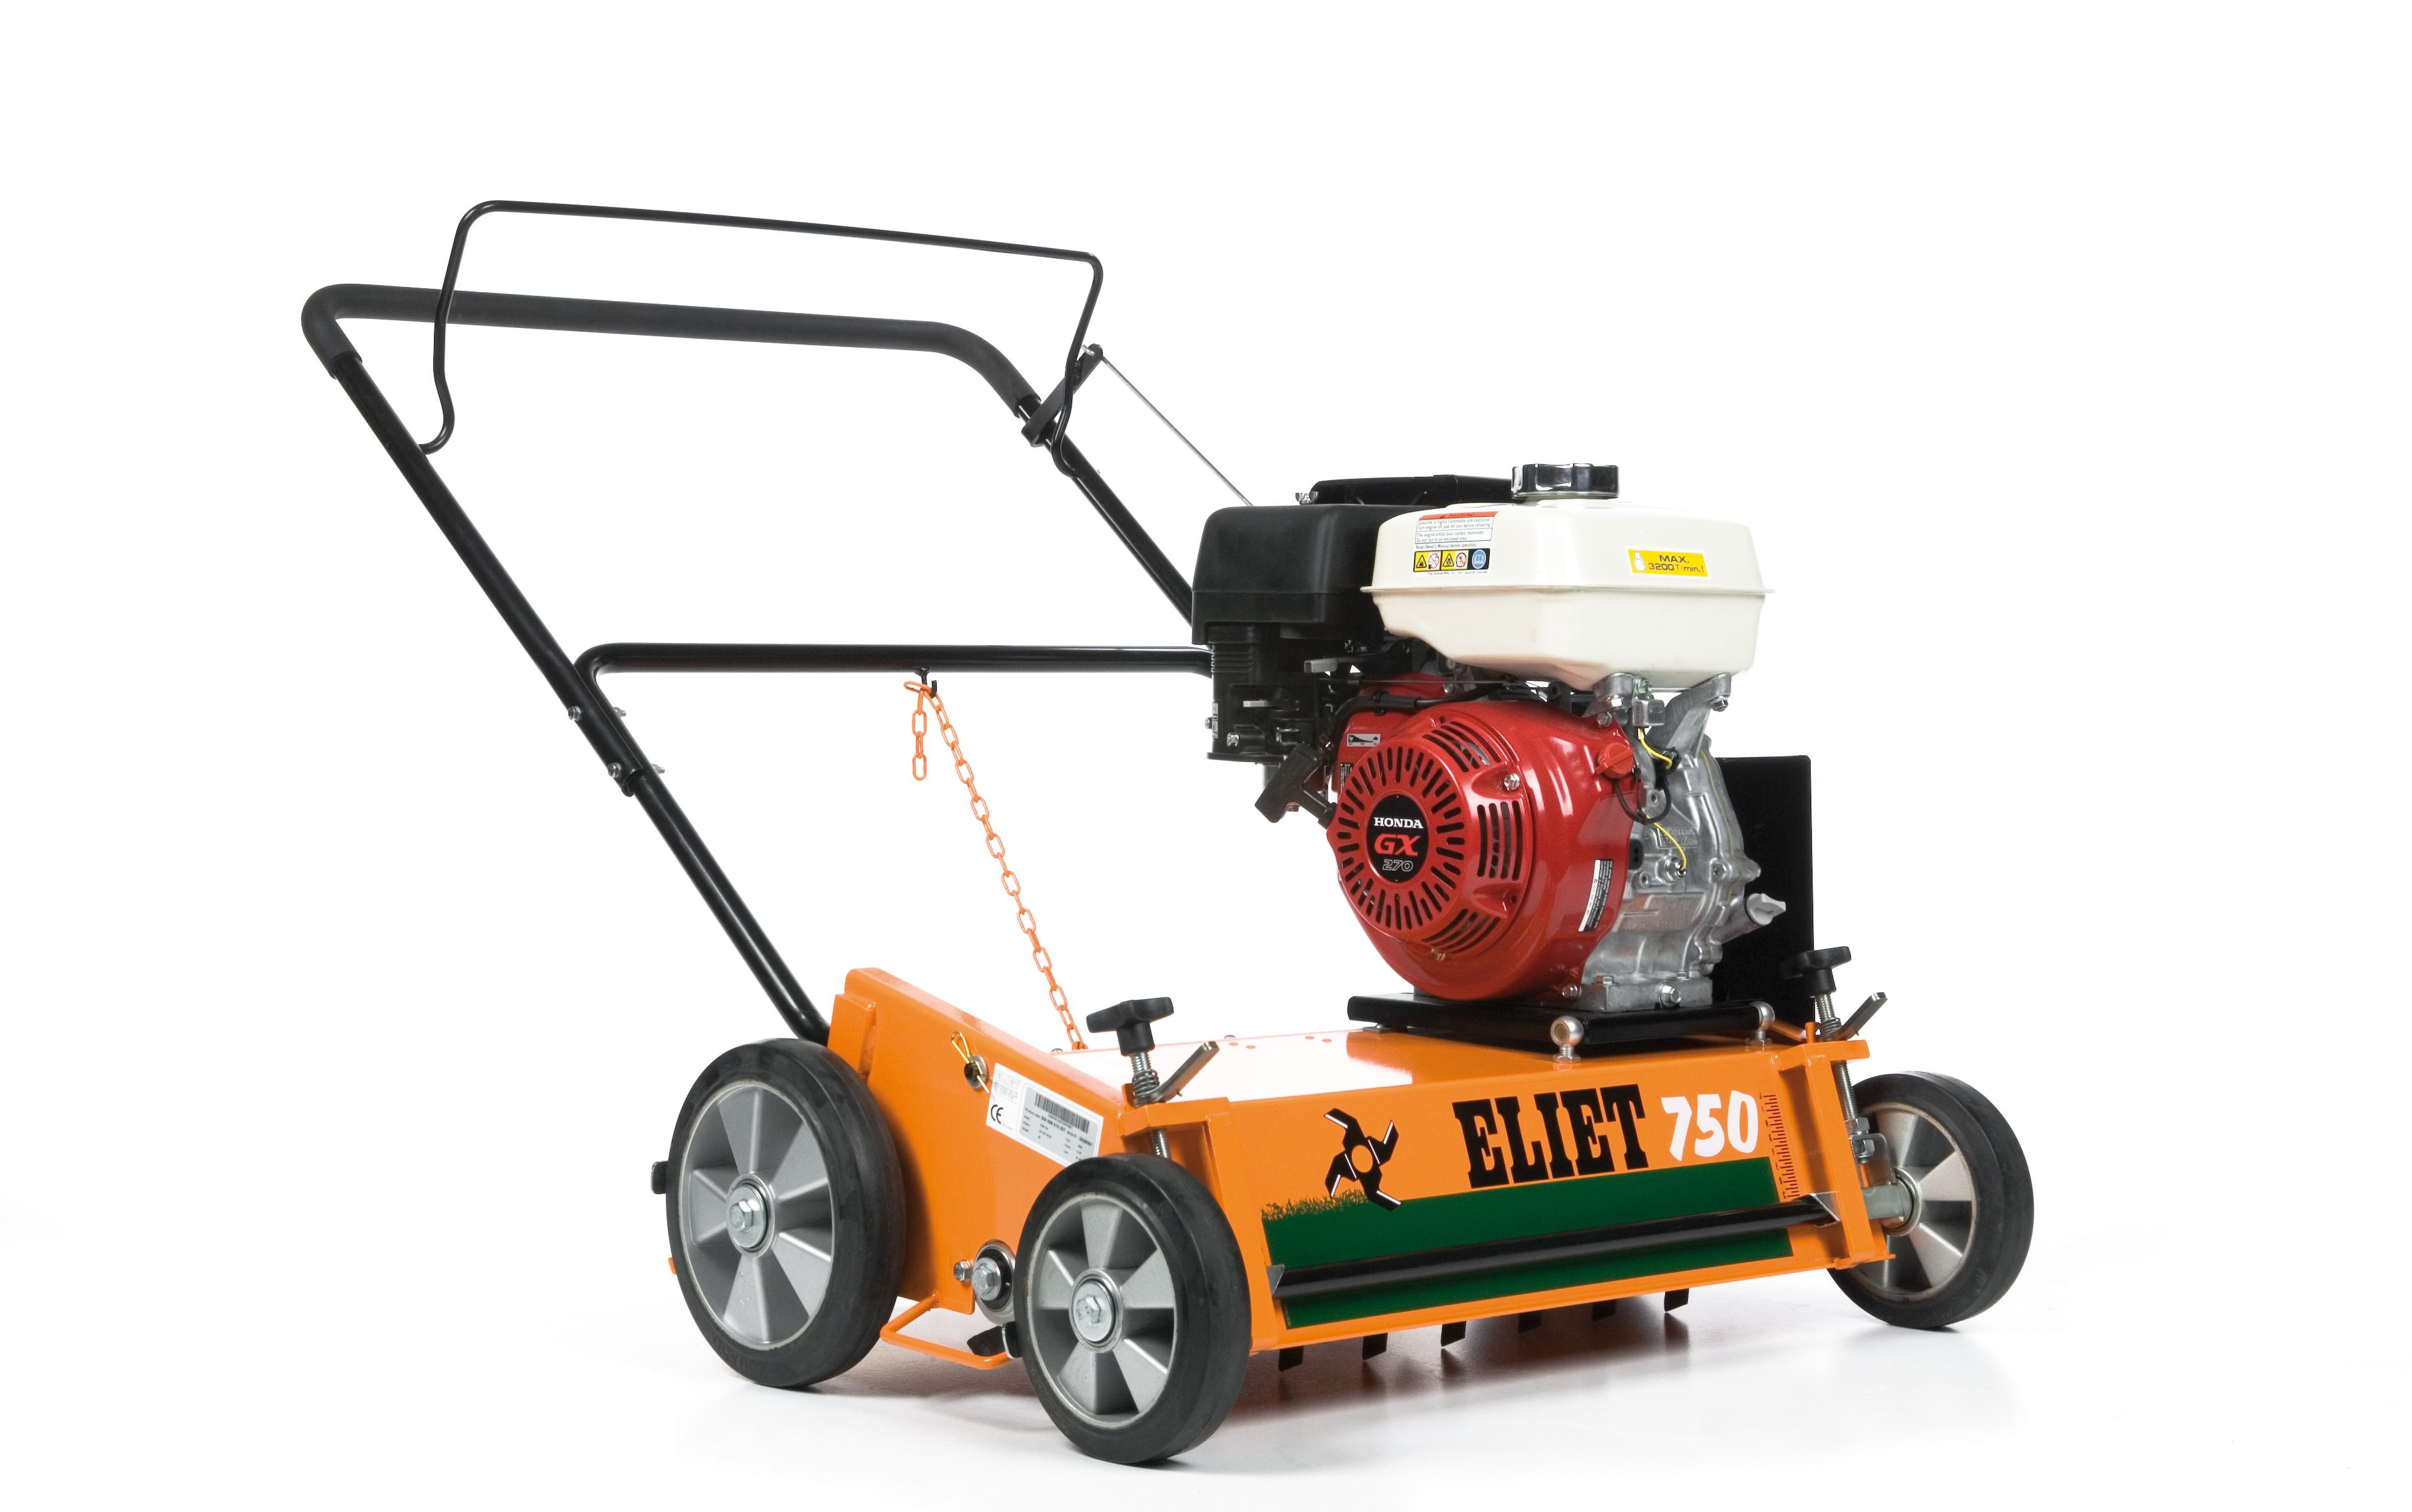 ELIET E750 PRO VM verticuteermachine